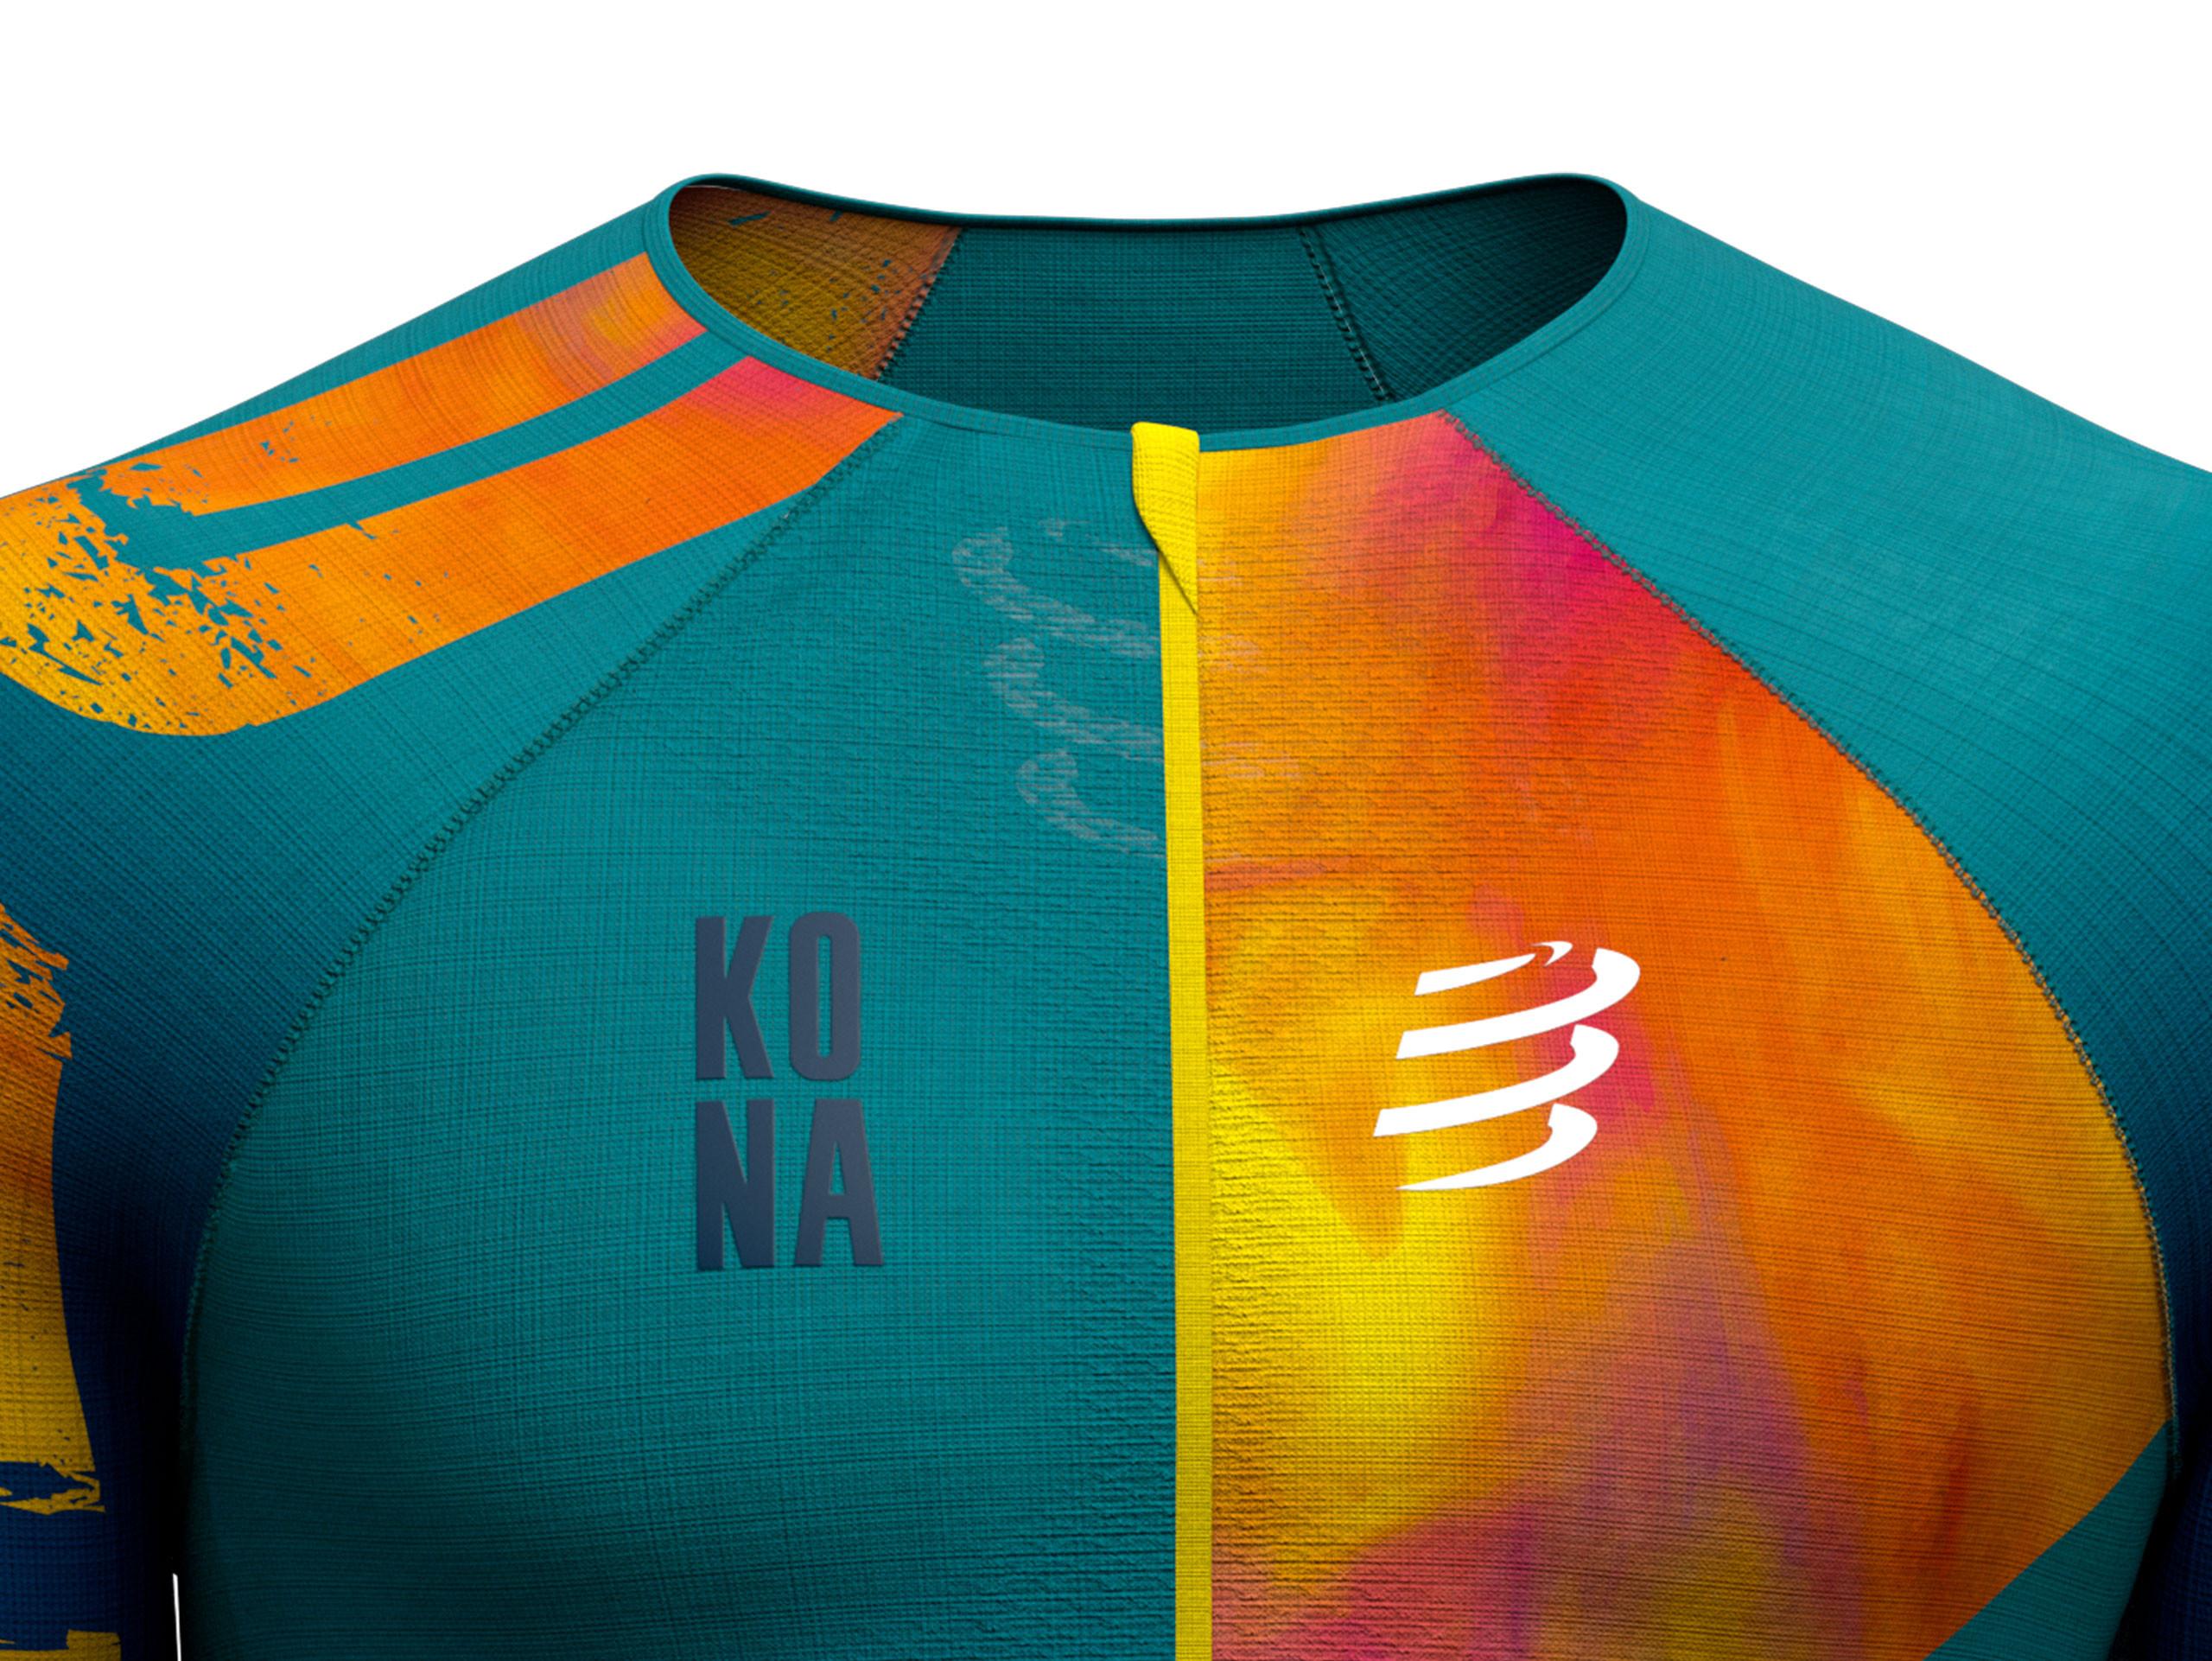 Maglia posturale da triathlon Aero SS - Kona 2019